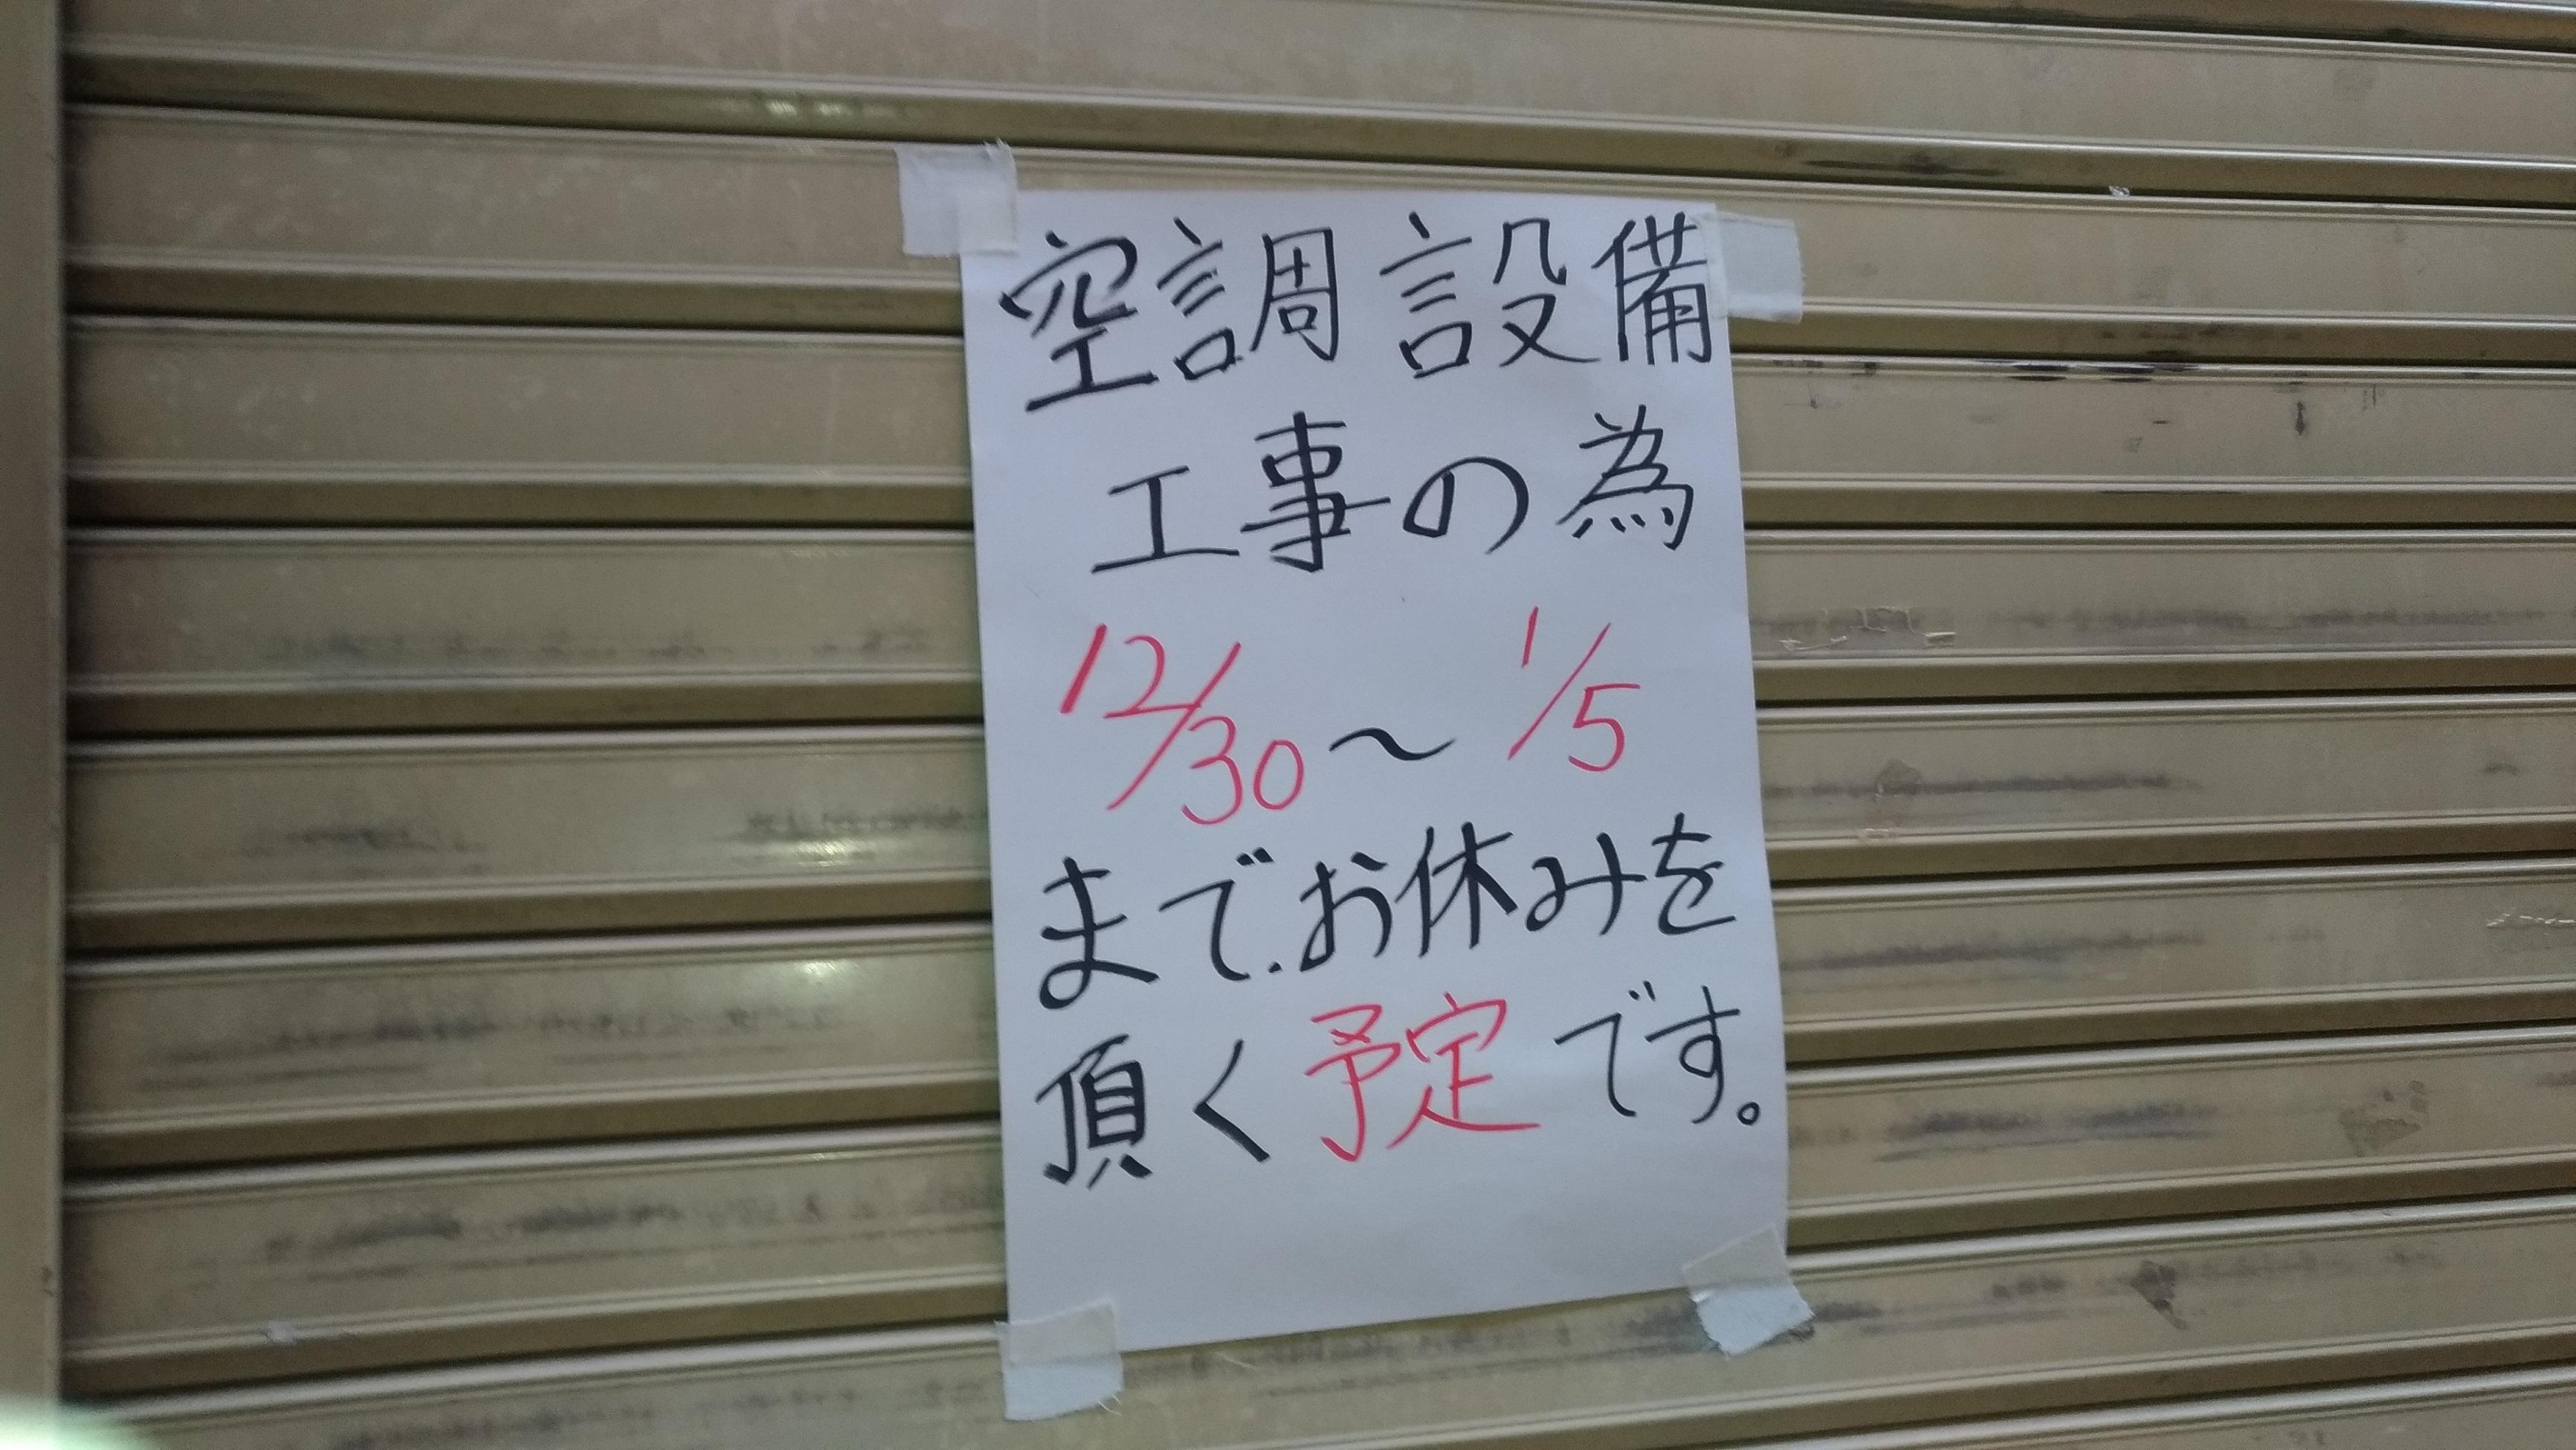 harukoma_sushi_2020_2021_.jpg